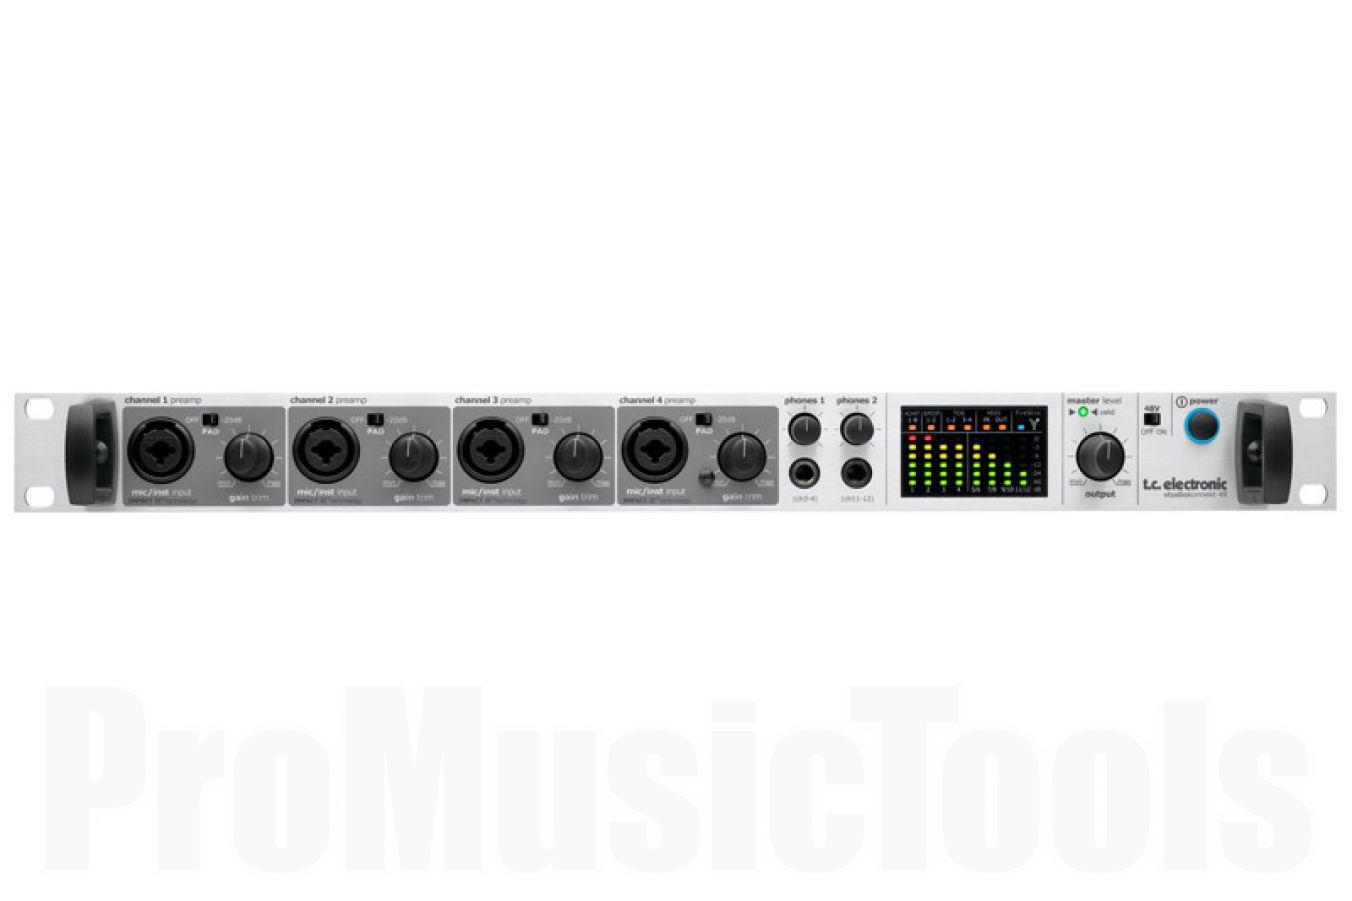 TC Electronic Studio Konnekt 48 incl. Remote - b-stock (1x opened box)